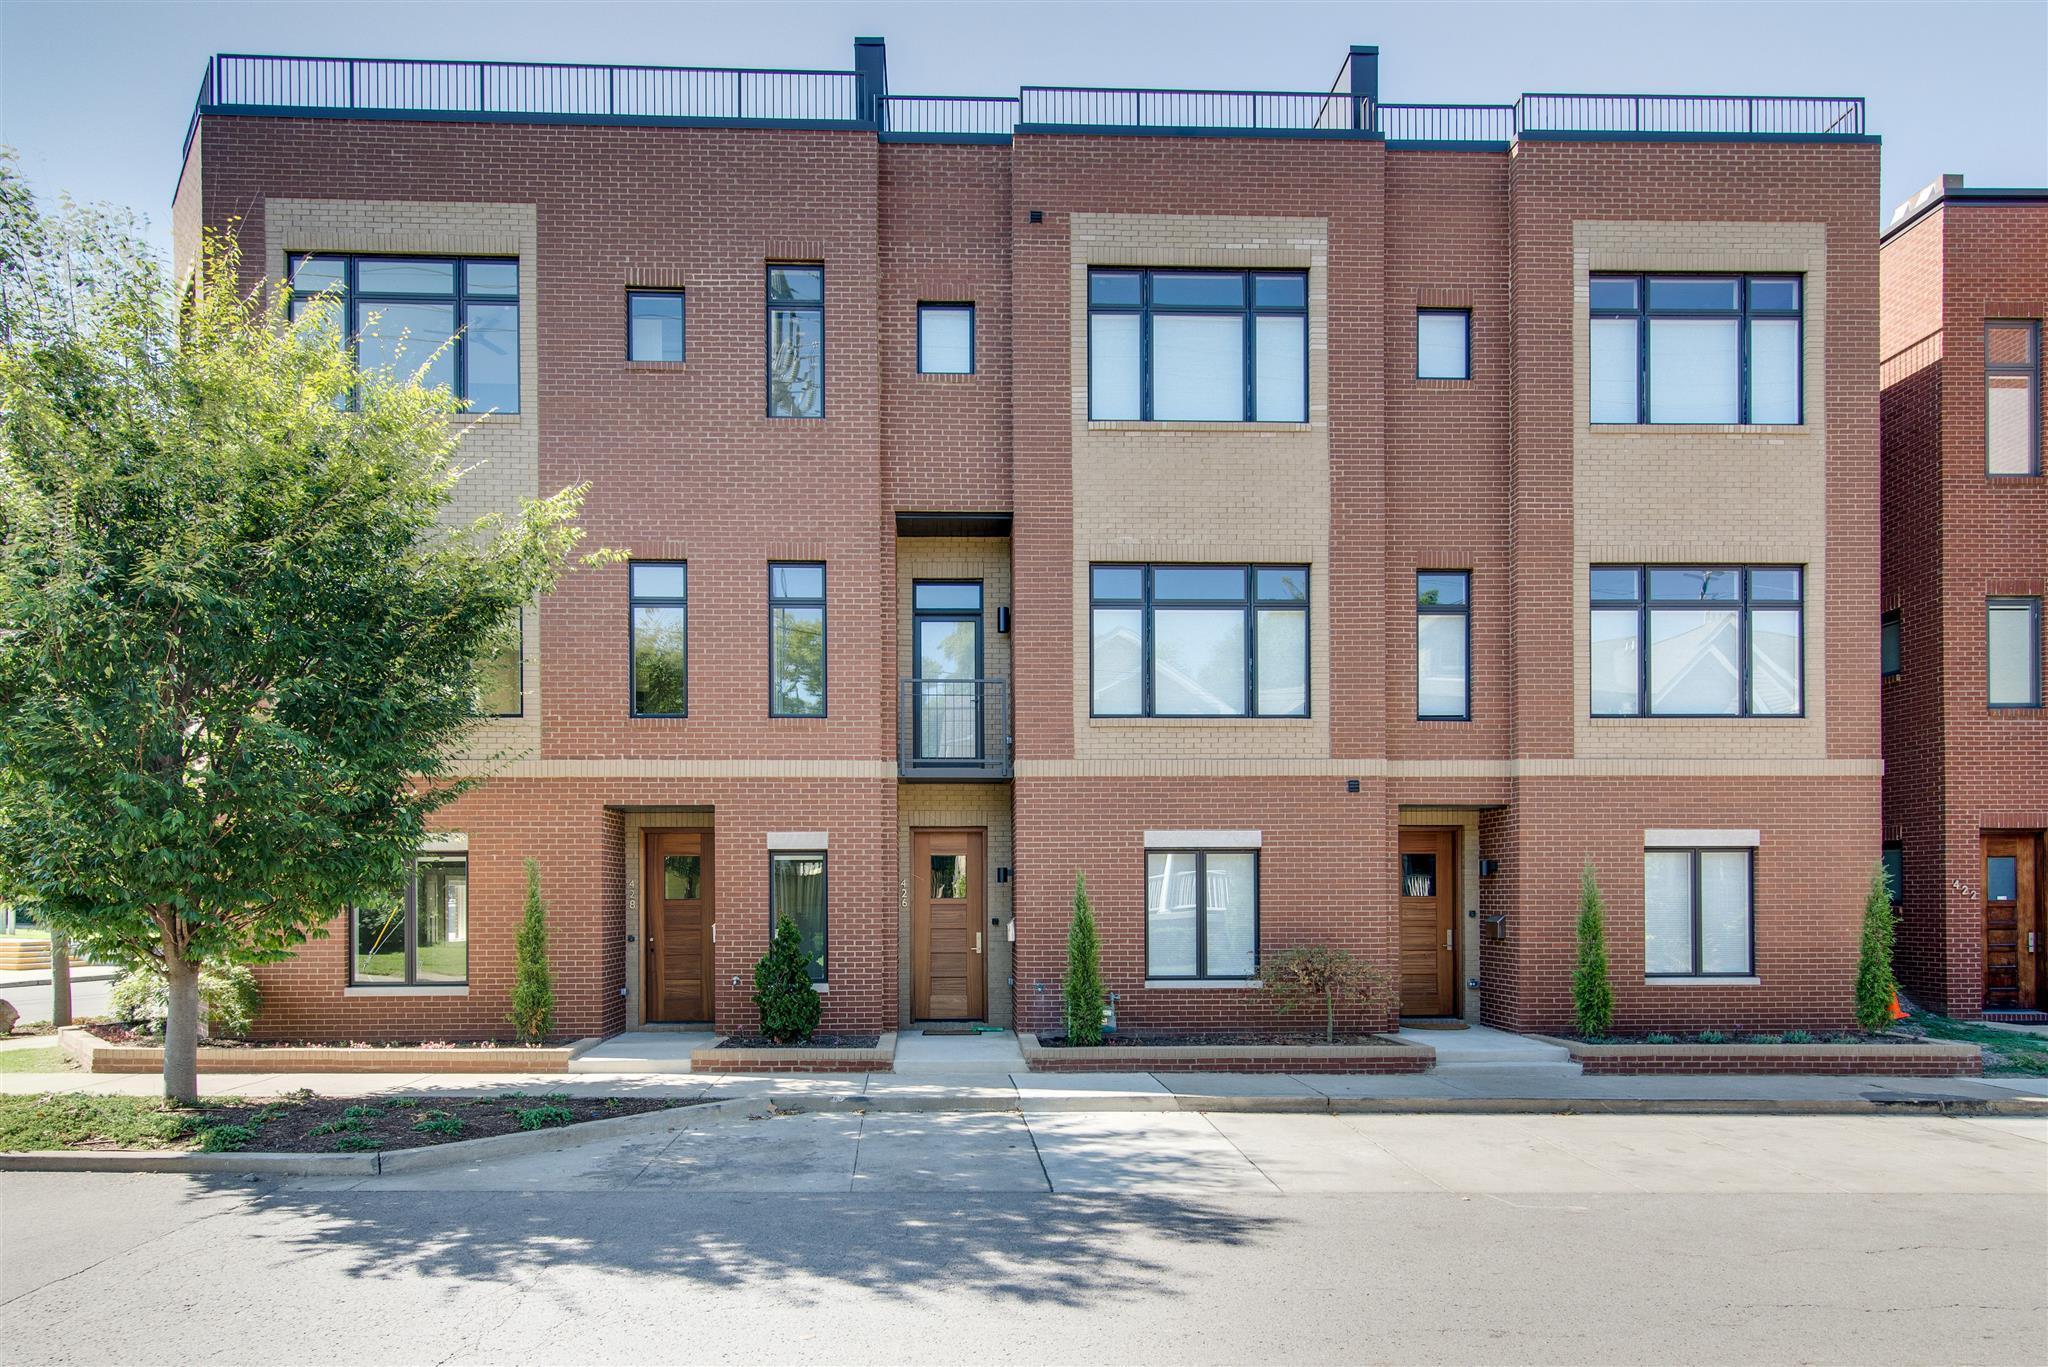 428 Van Buren St, Nashville, TN 37208 - Nashville, TN real estate listing